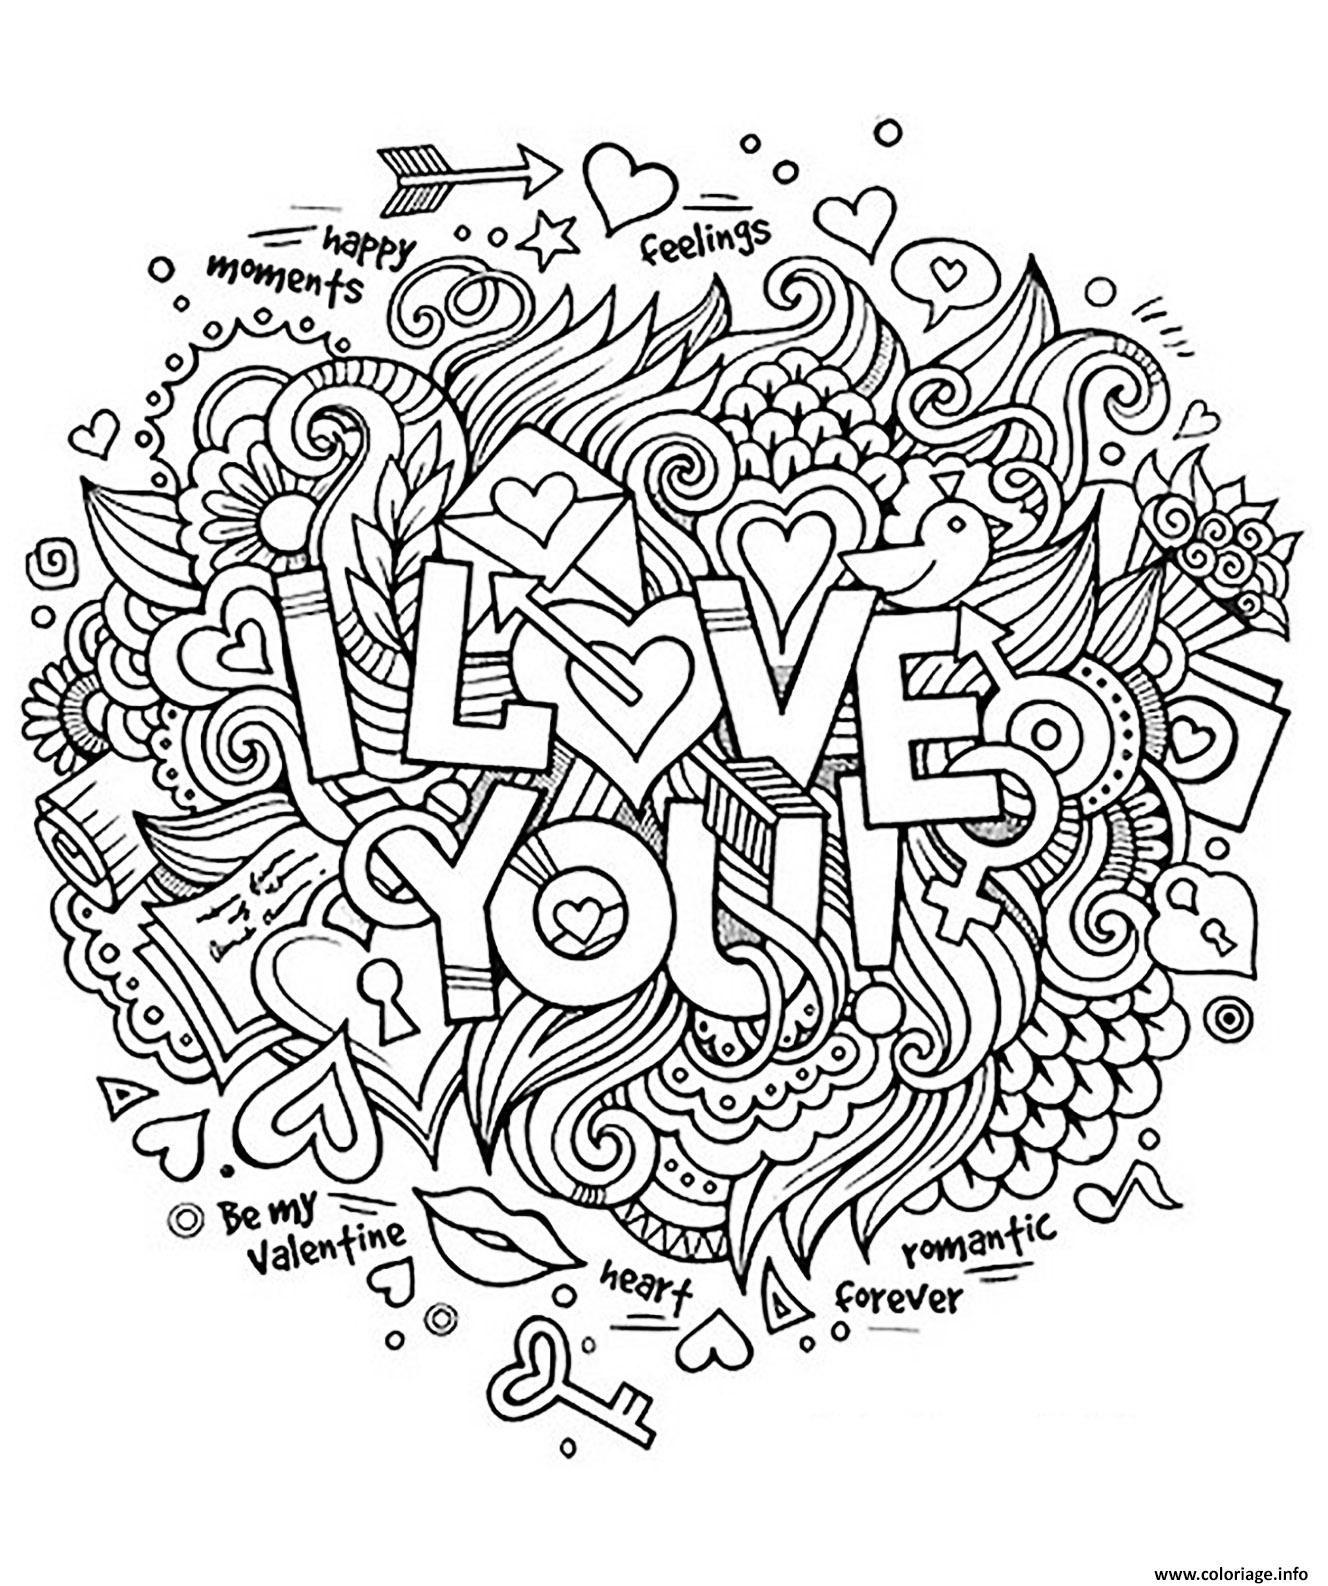 Coloriage A Imprimer Amour.Epingle Sur Words To Live By